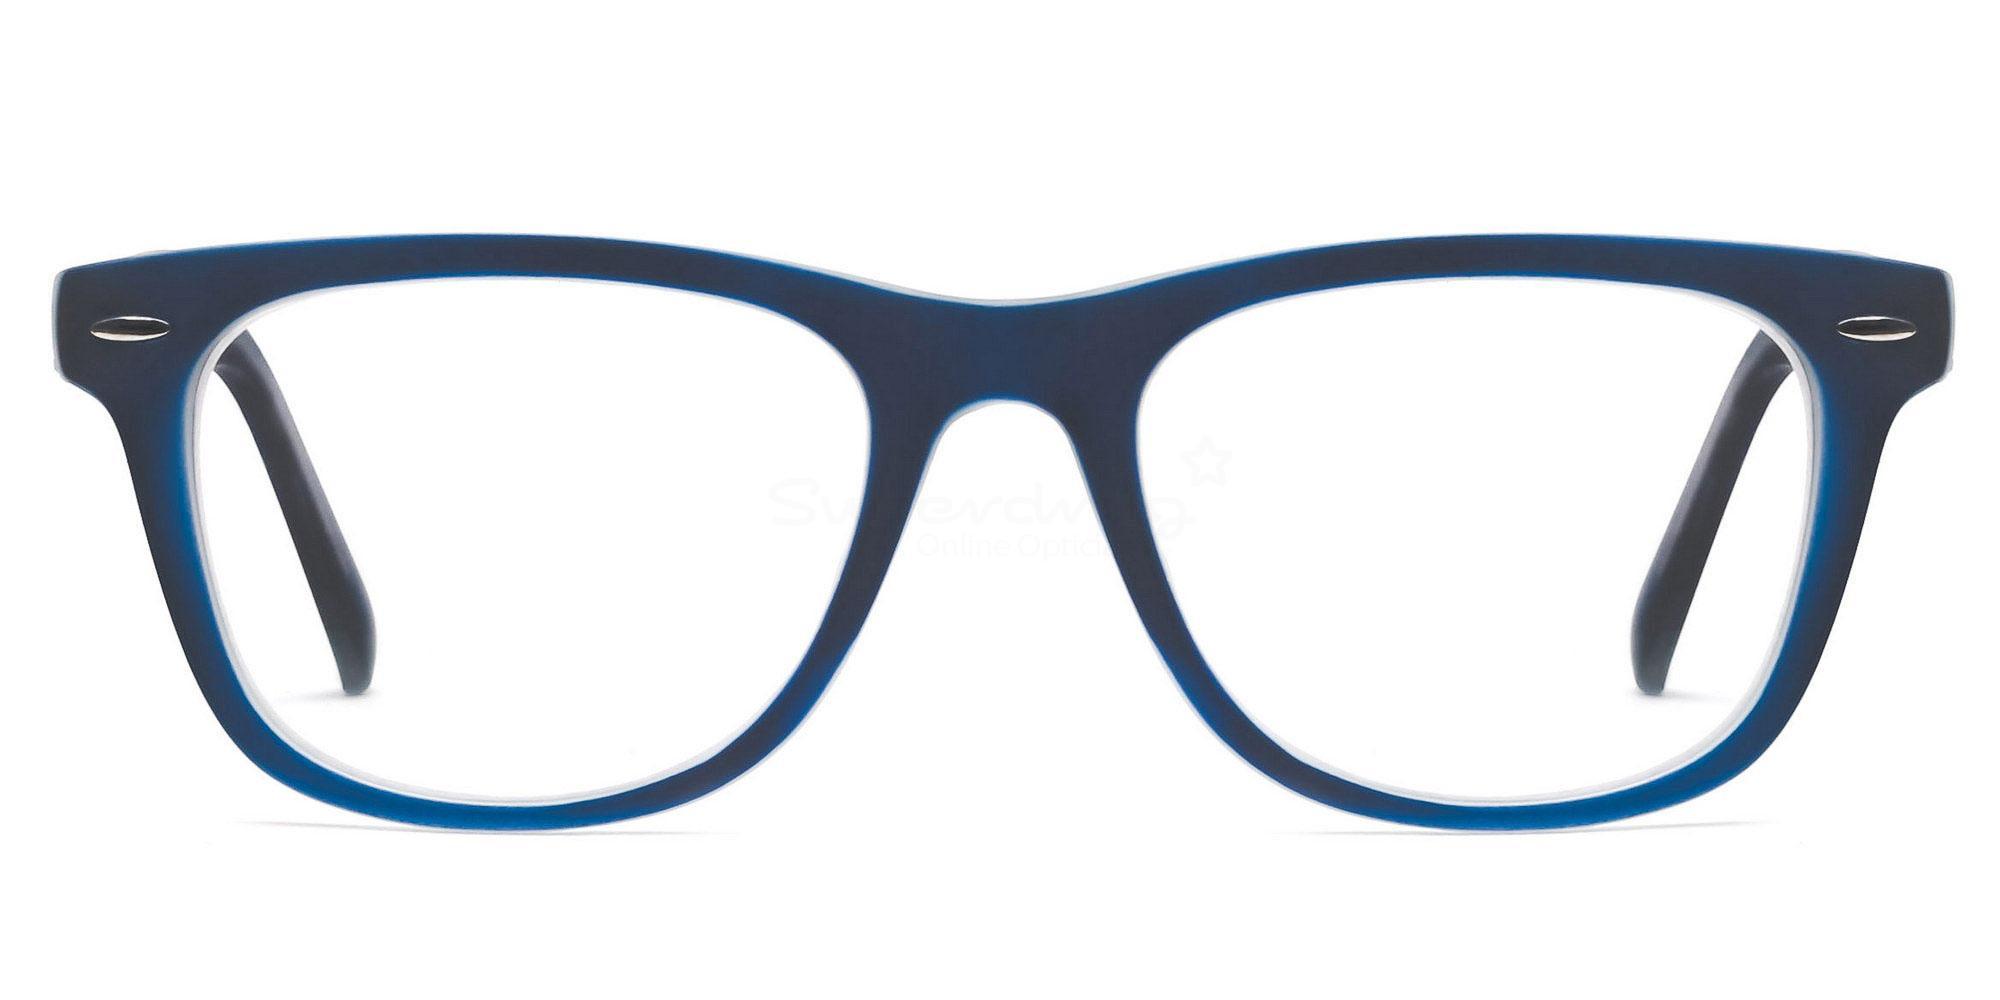 C14 8121 - Navy on Transparent Glasses, Helium